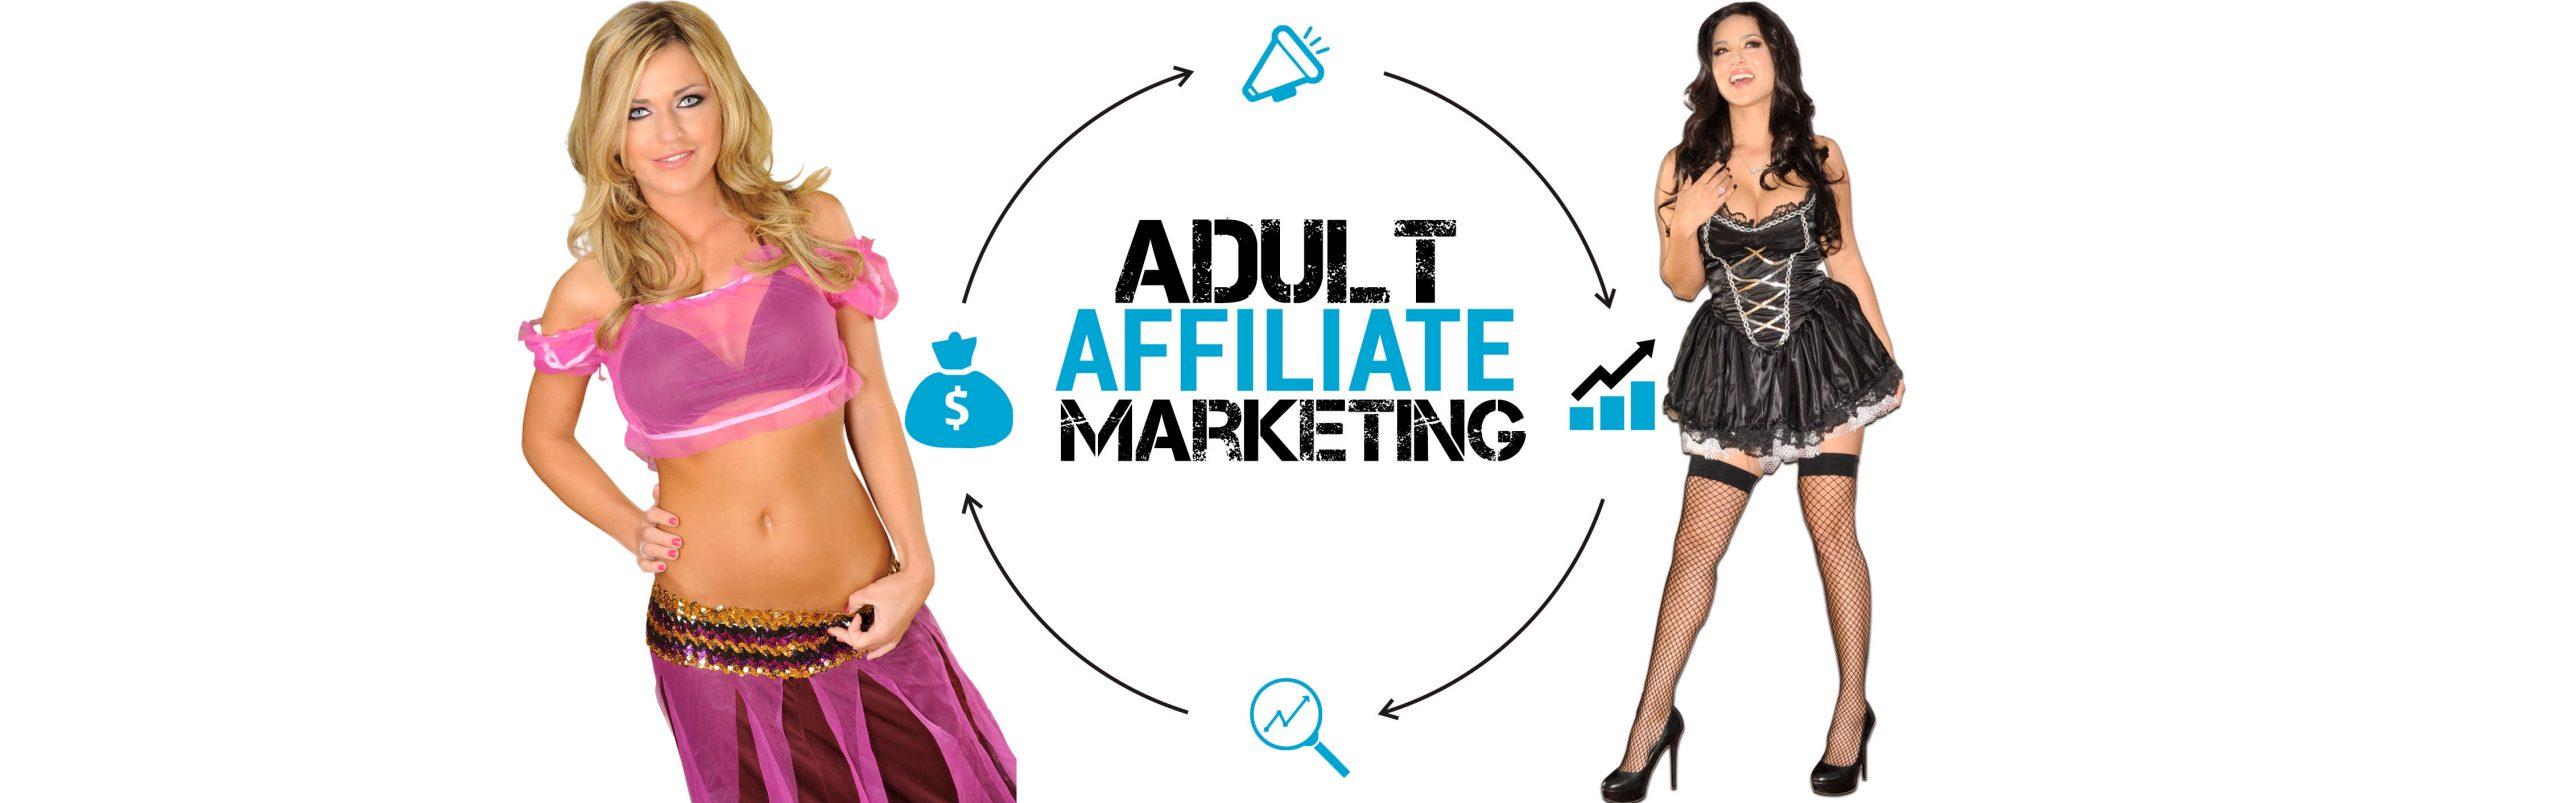 Is affiliate marketing dead in 2018?